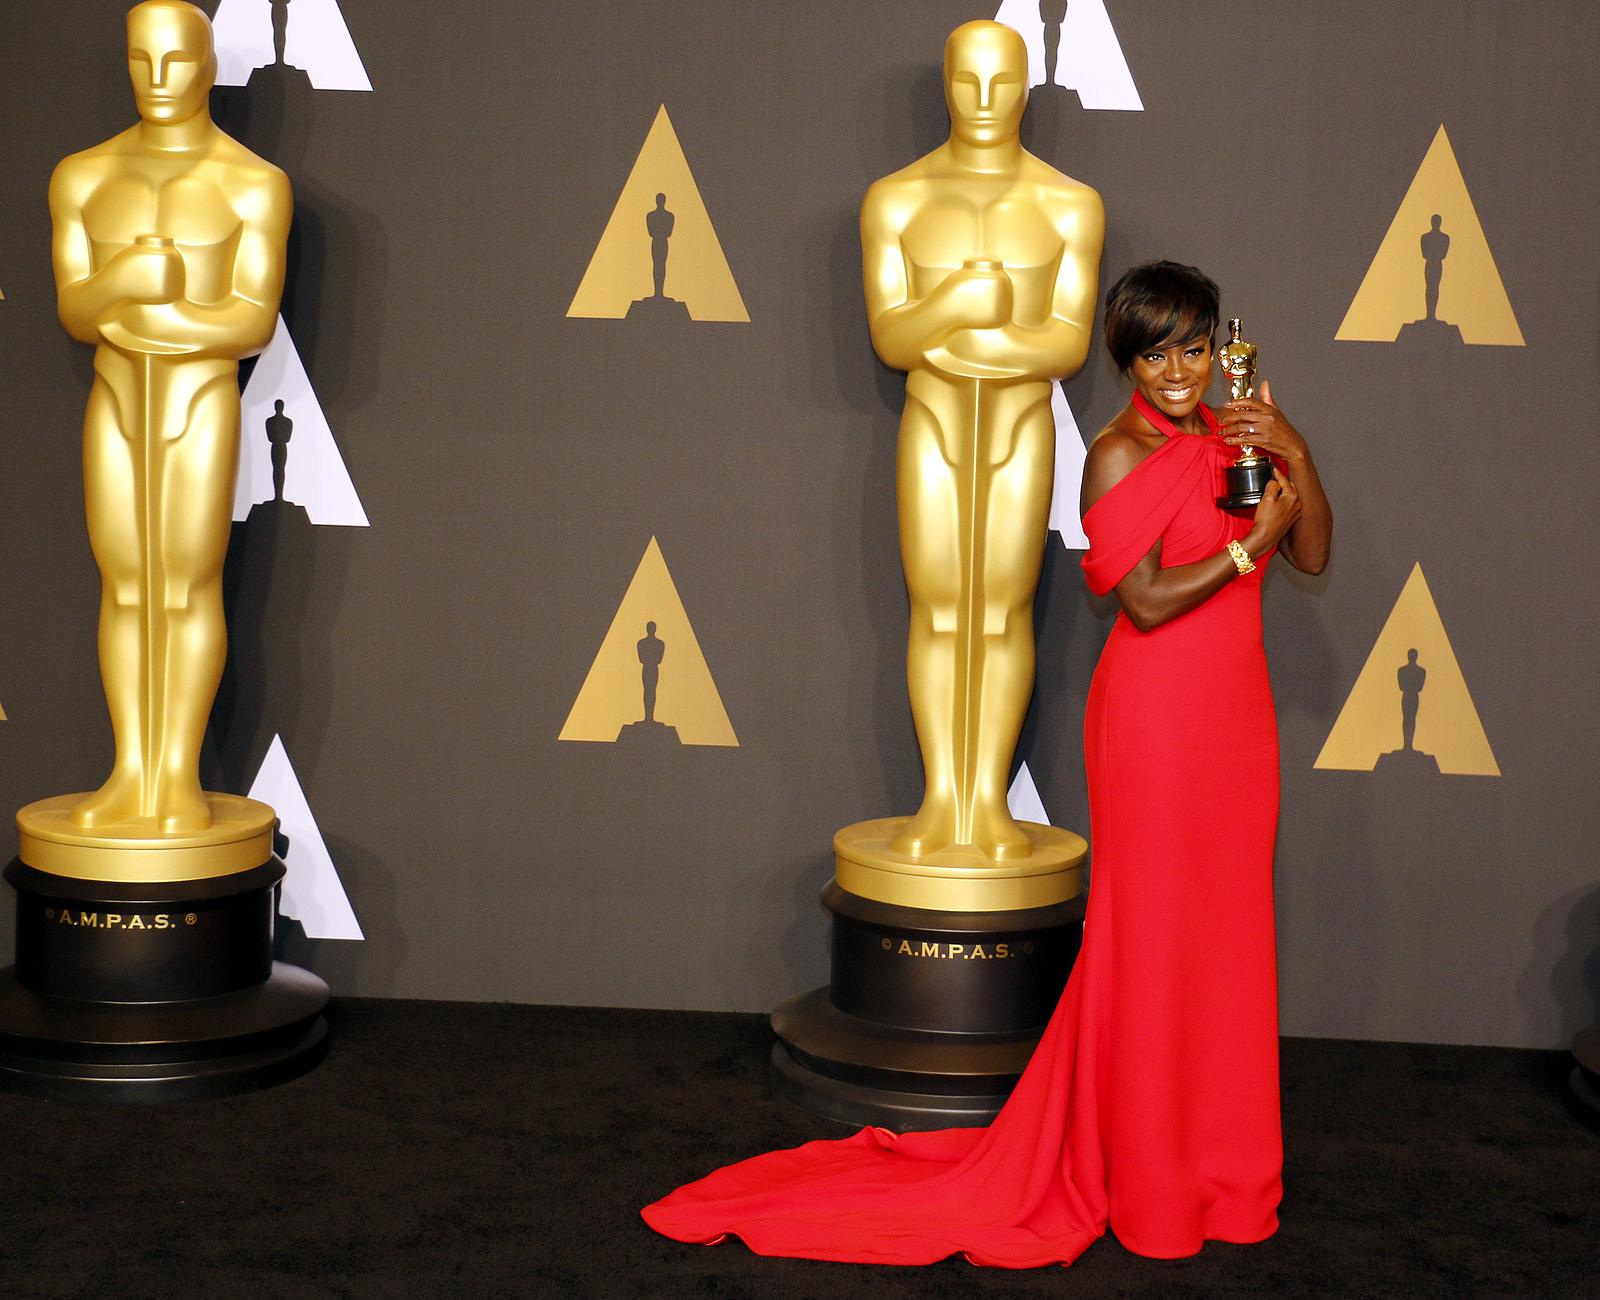 Viola Davis receiving an oscar award with a long red dress.